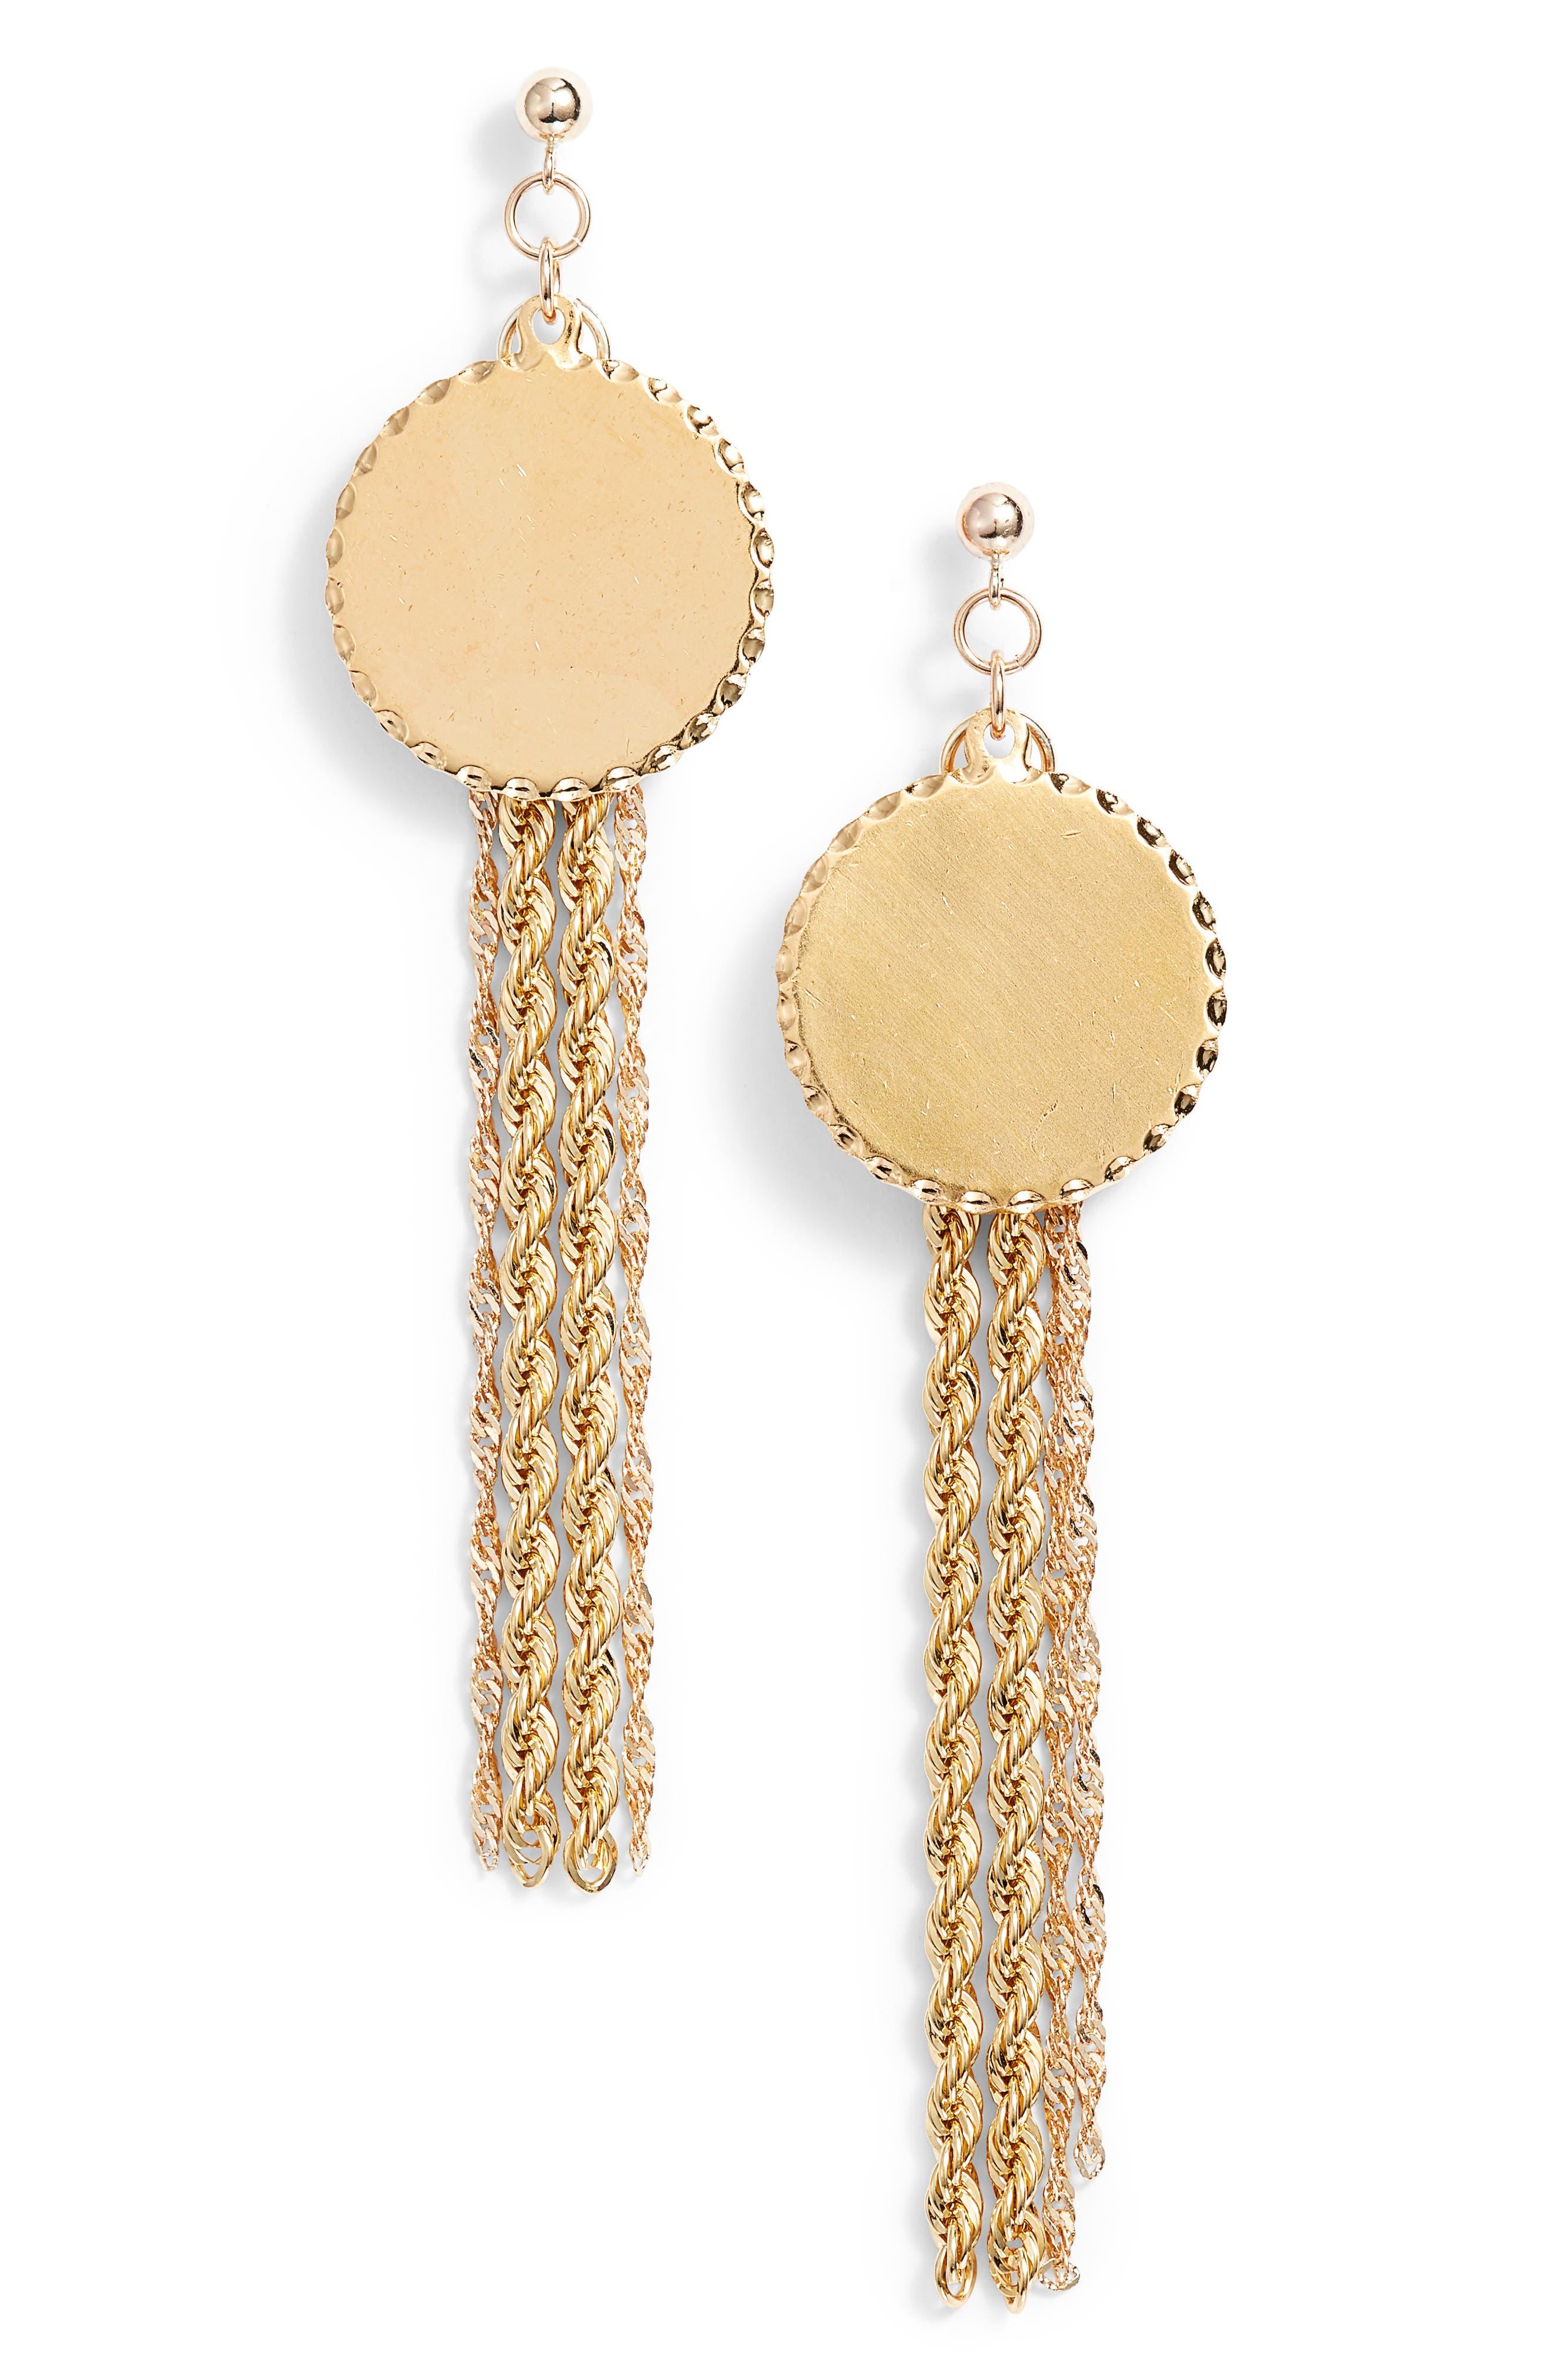 Temperance Chain Fringe Earrings,                             Main thumbnail 1, color,                             Yellow Gold